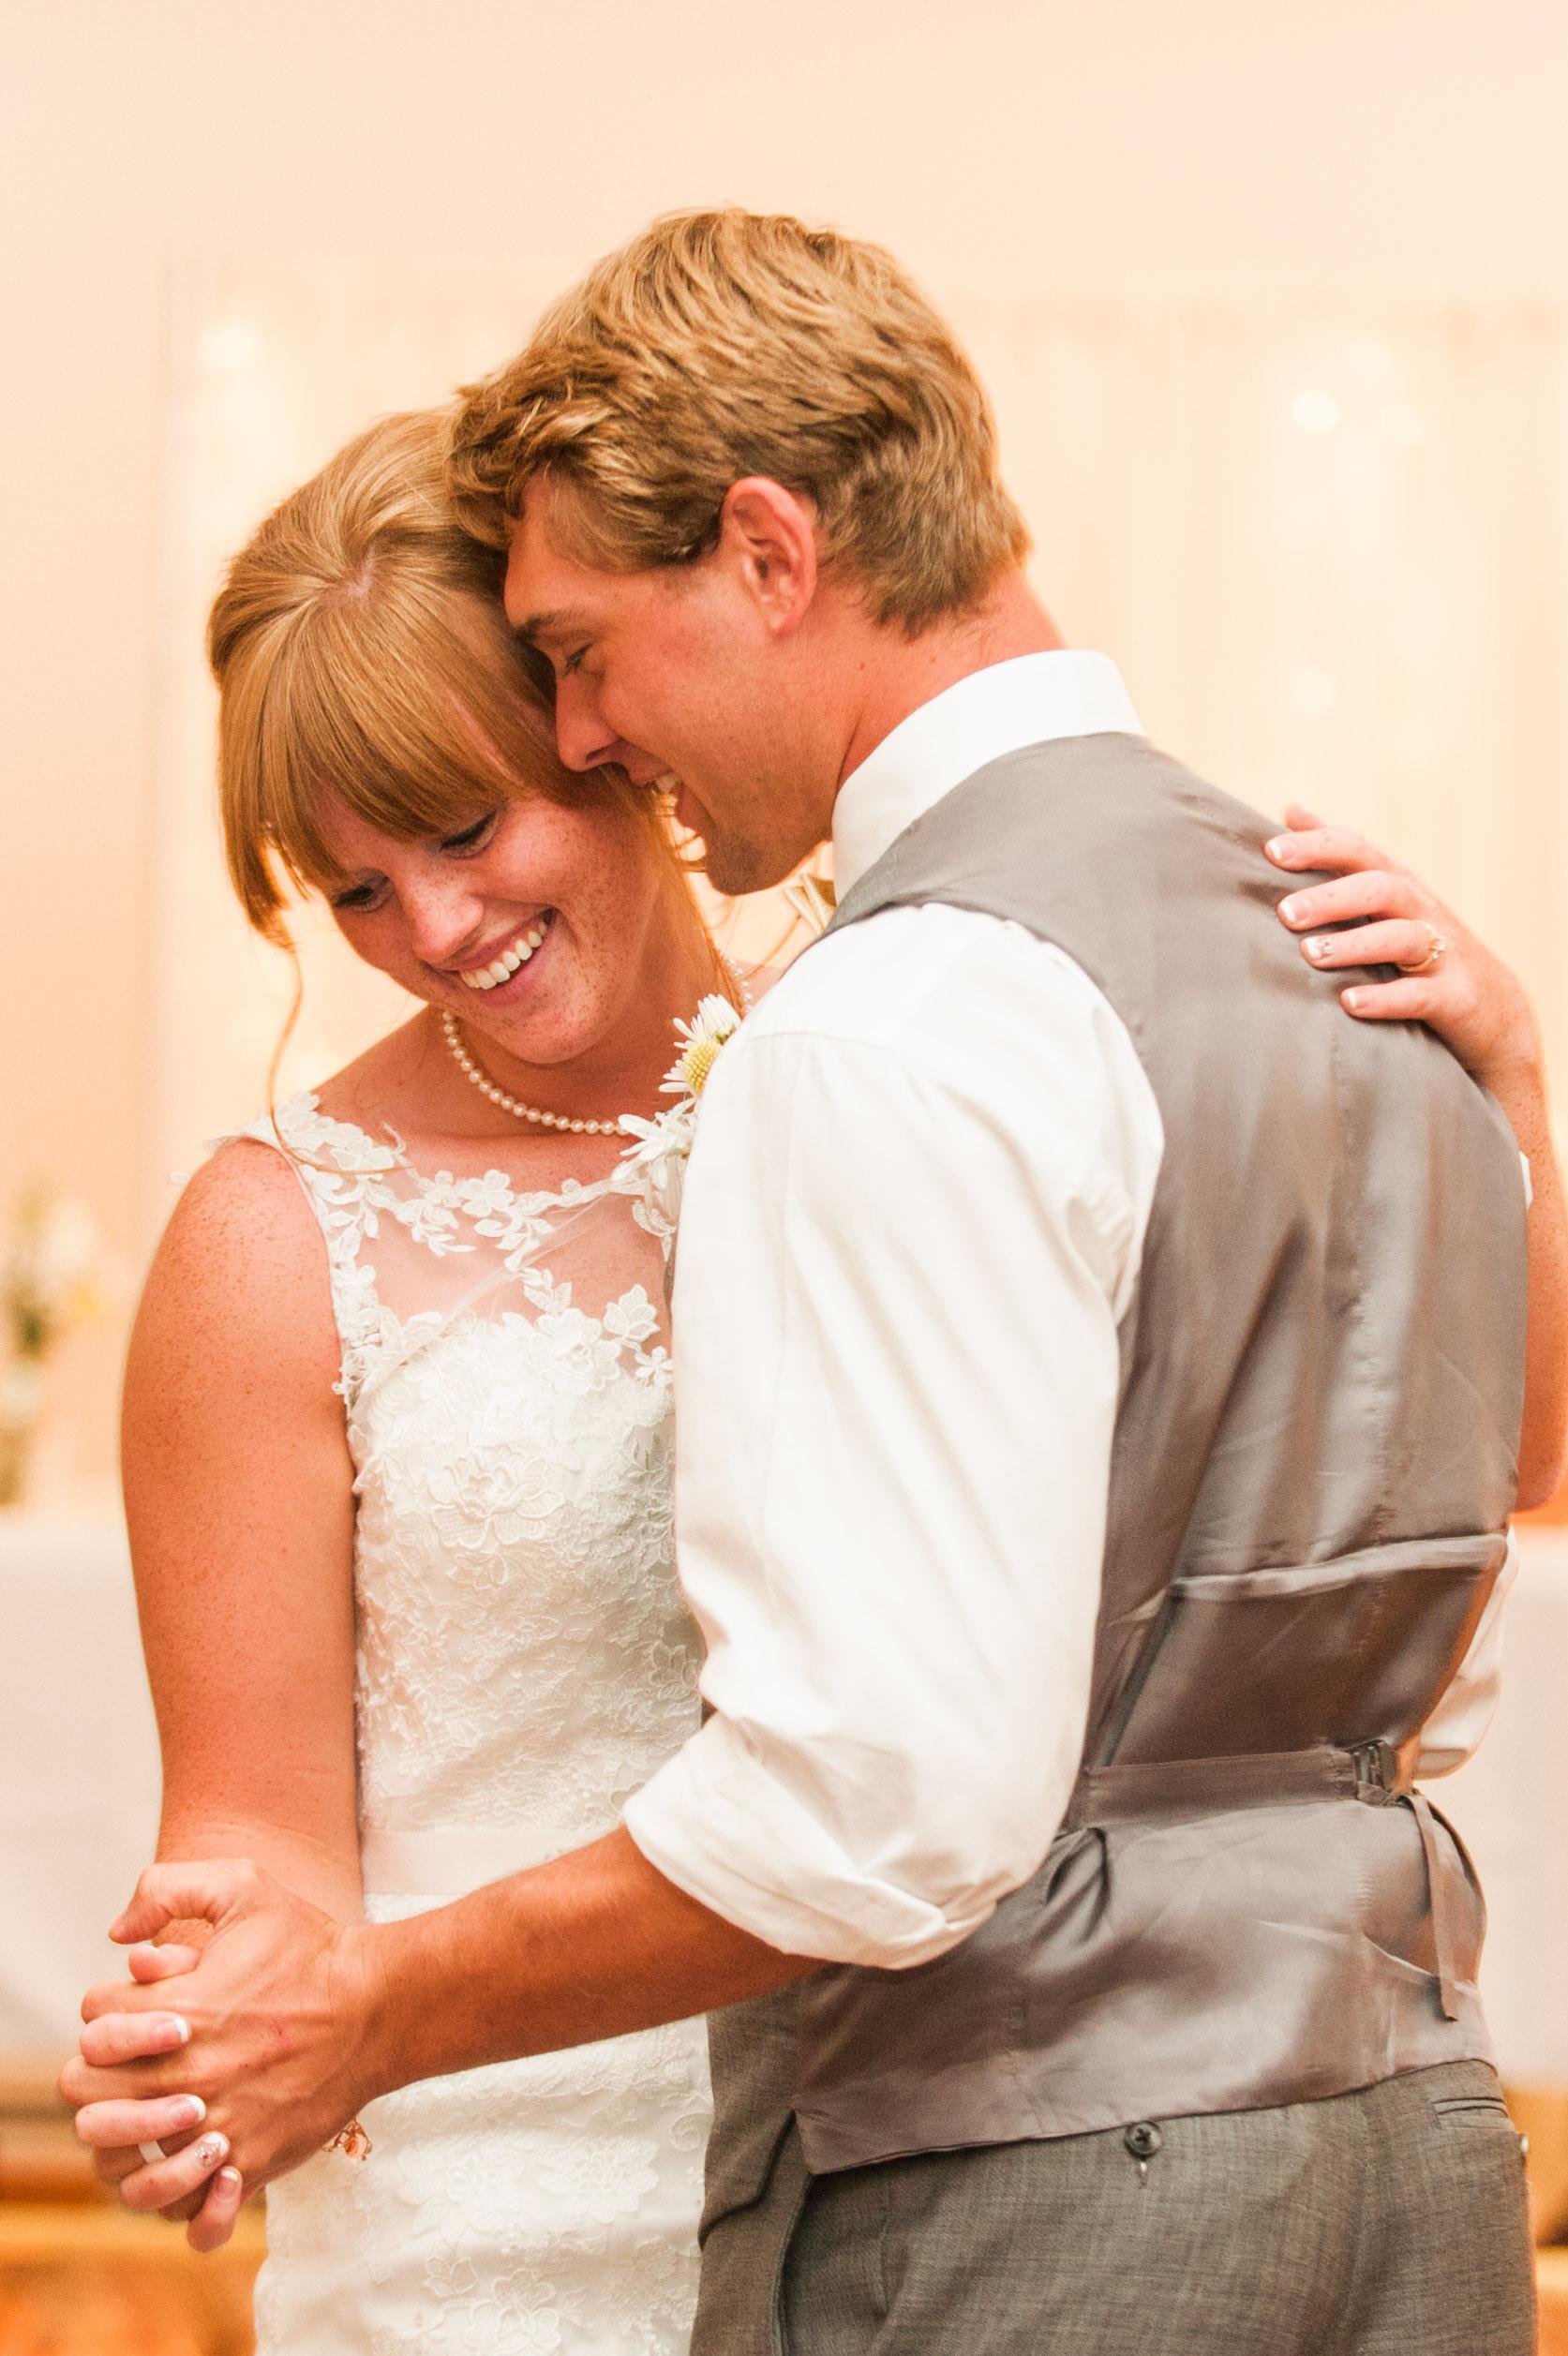 wedding-photography-37.jpg